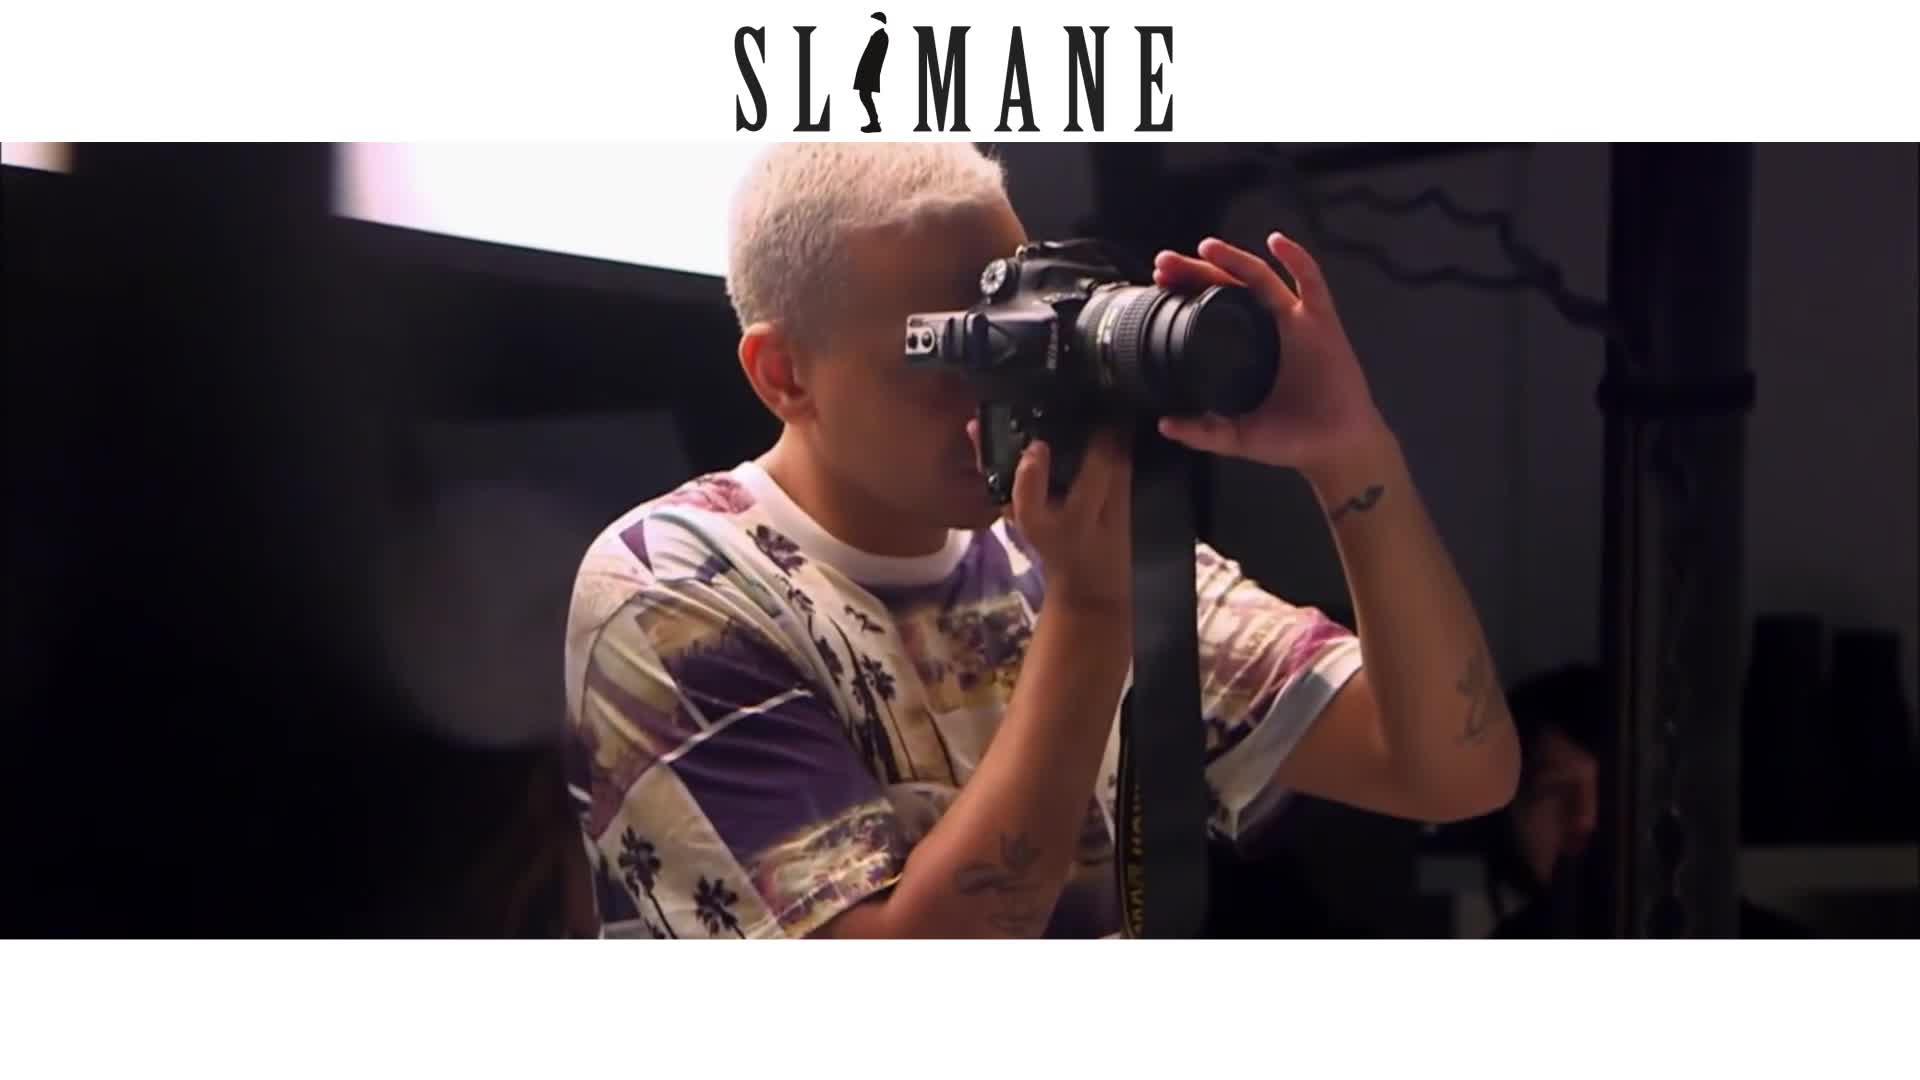 Slimane-Teaser-01-V2